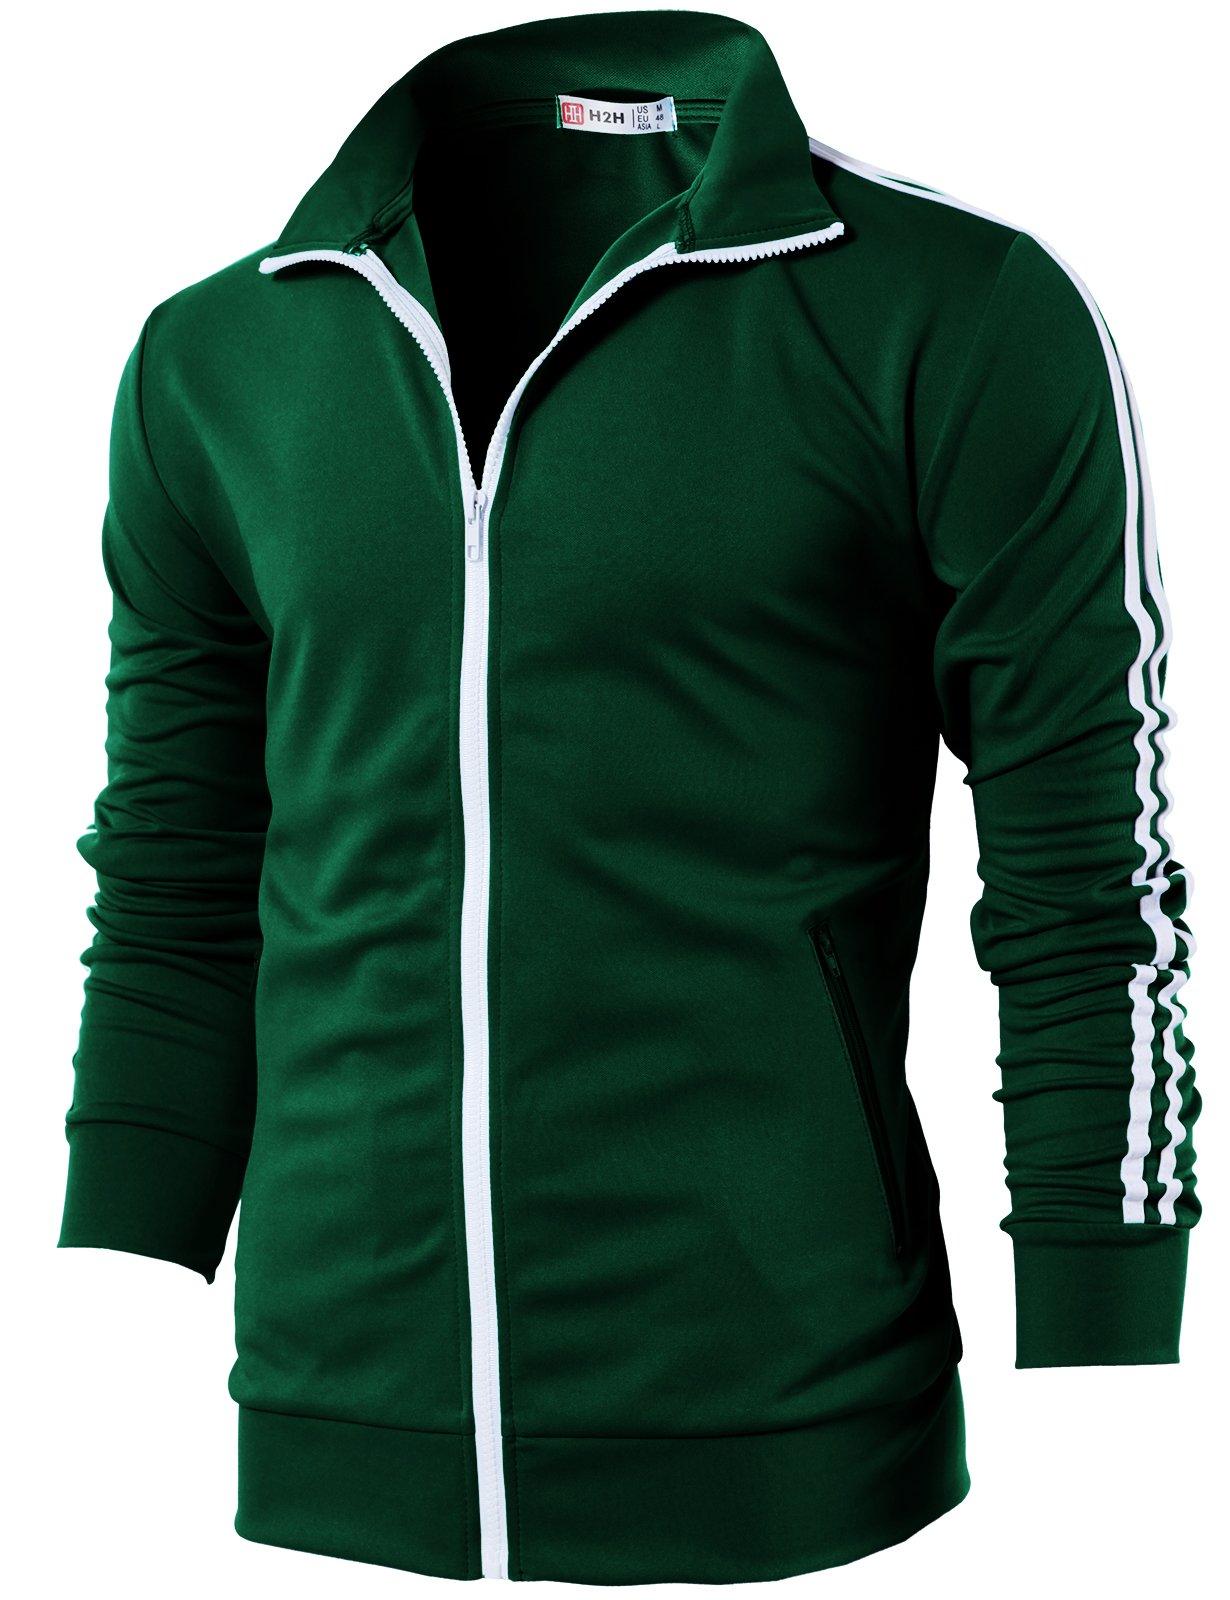 H2H Mens Active Slim Fit Lightweight Line Training Full Zip-up Jacket DarkGreen US M/Asia L (CMOJA0103)